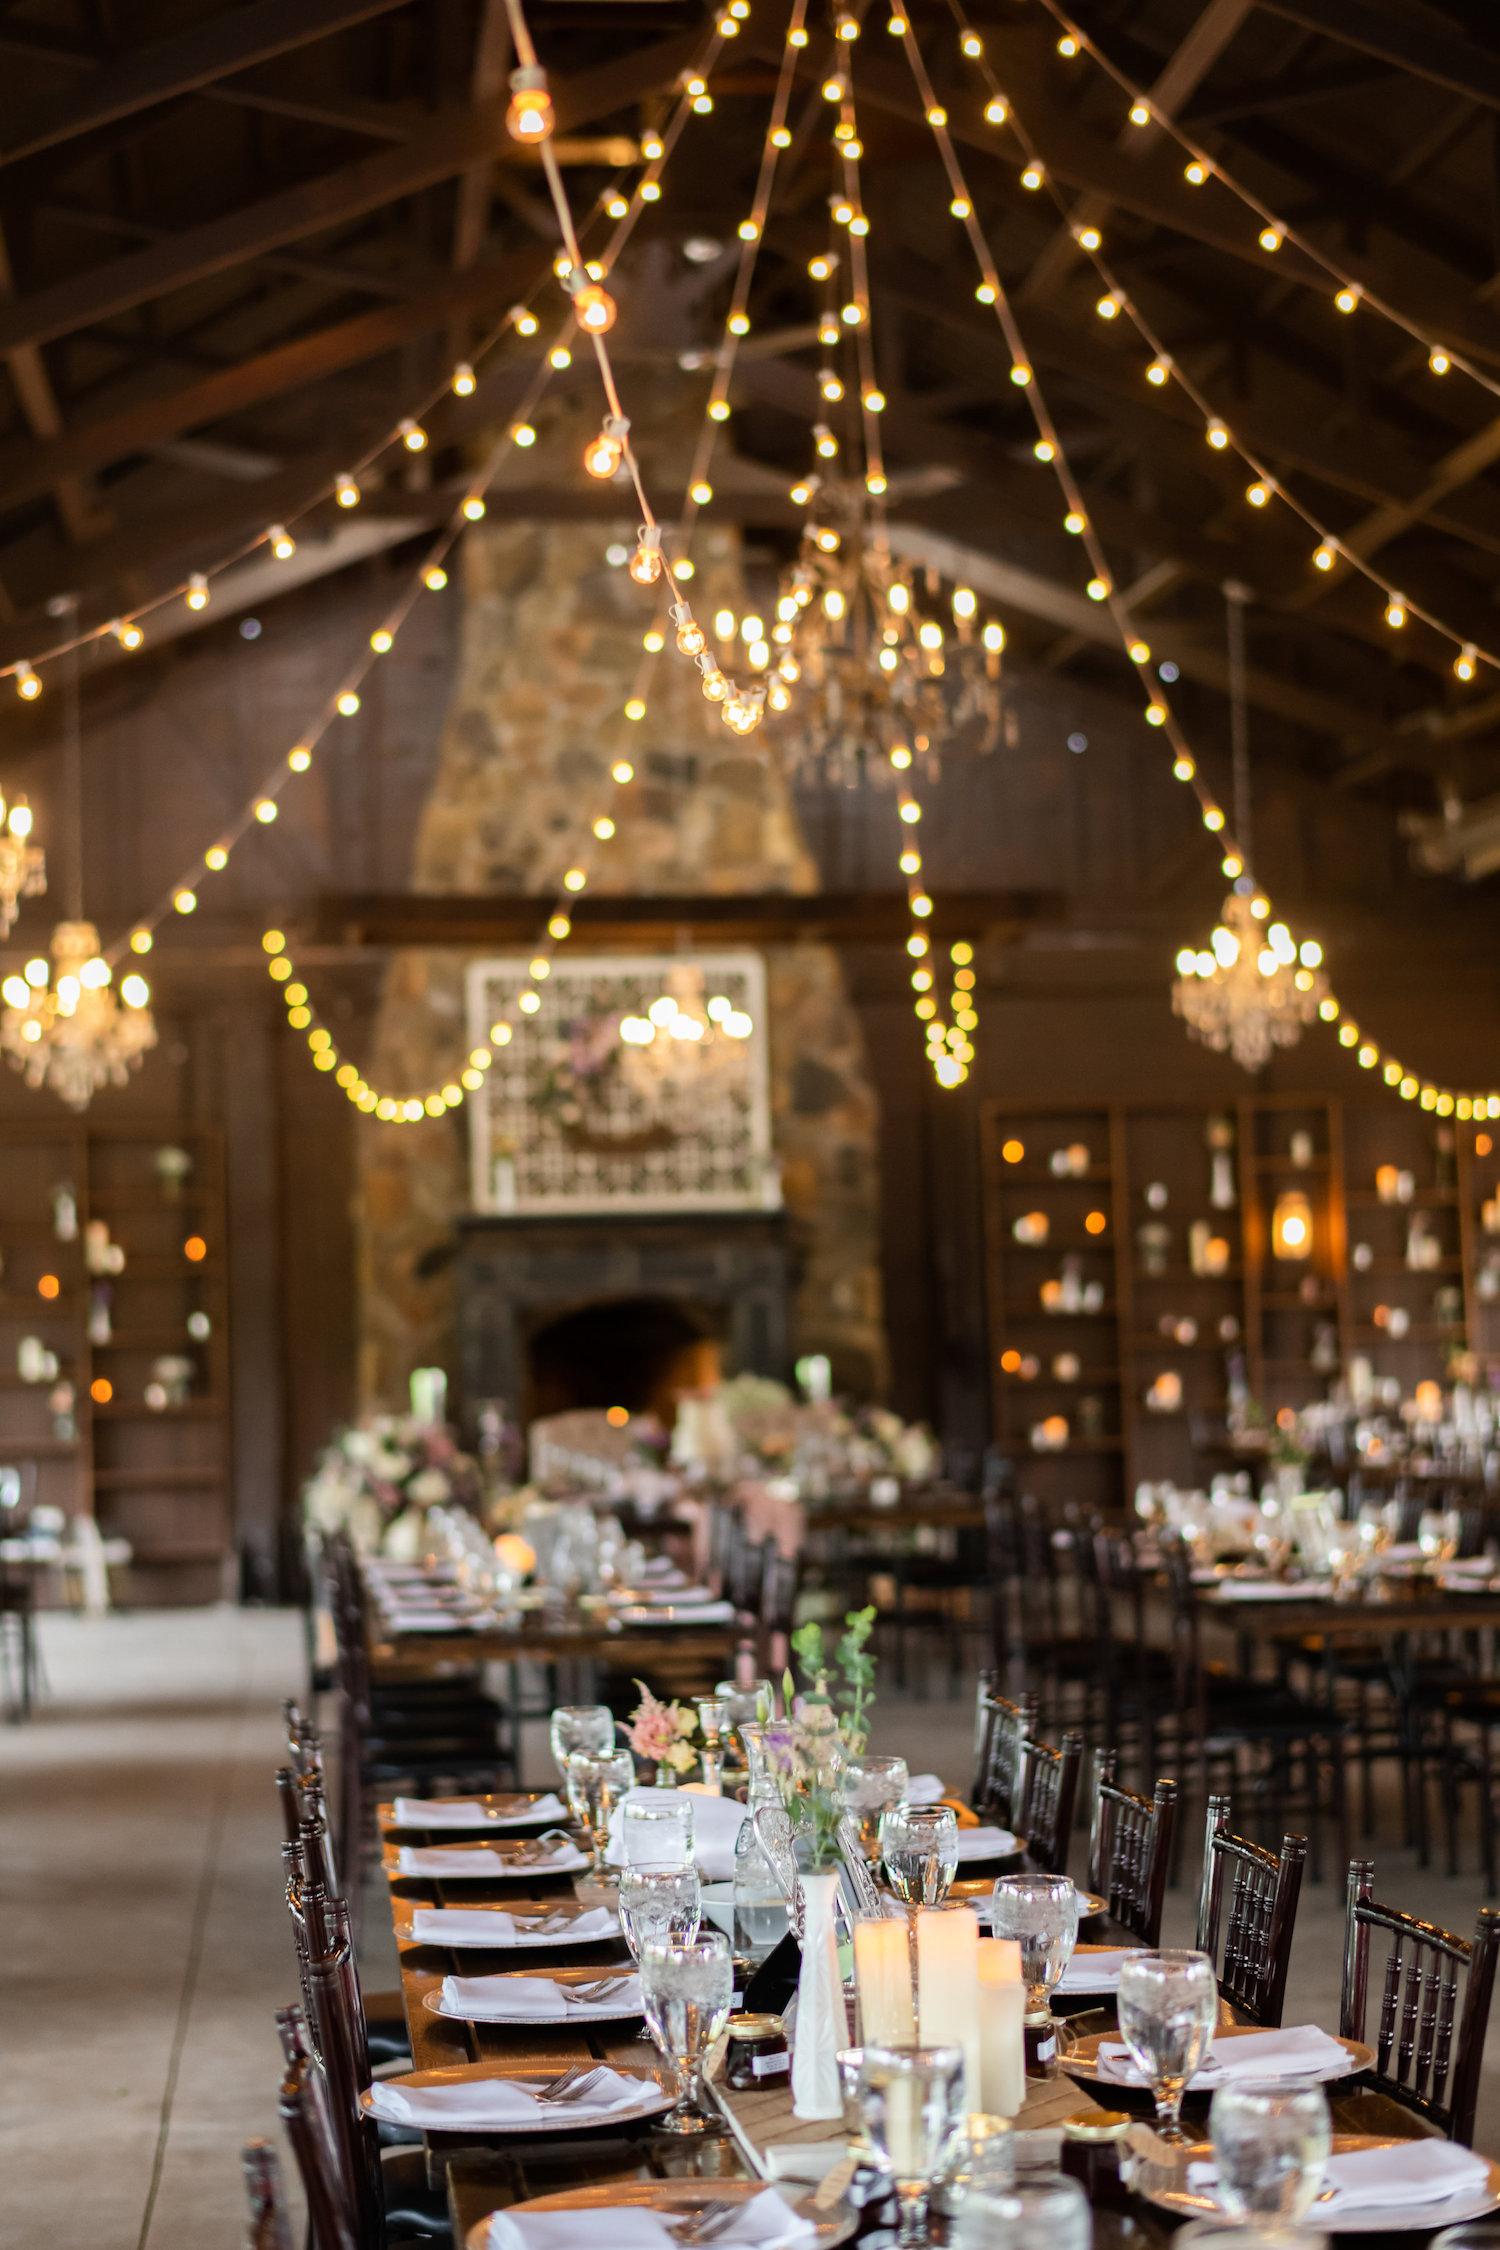 Sarah and Mark | Hope Glen Farm | Kelly Birch Photo | Sixpence Events & Planning wedding planning in Minnesota101.jpg